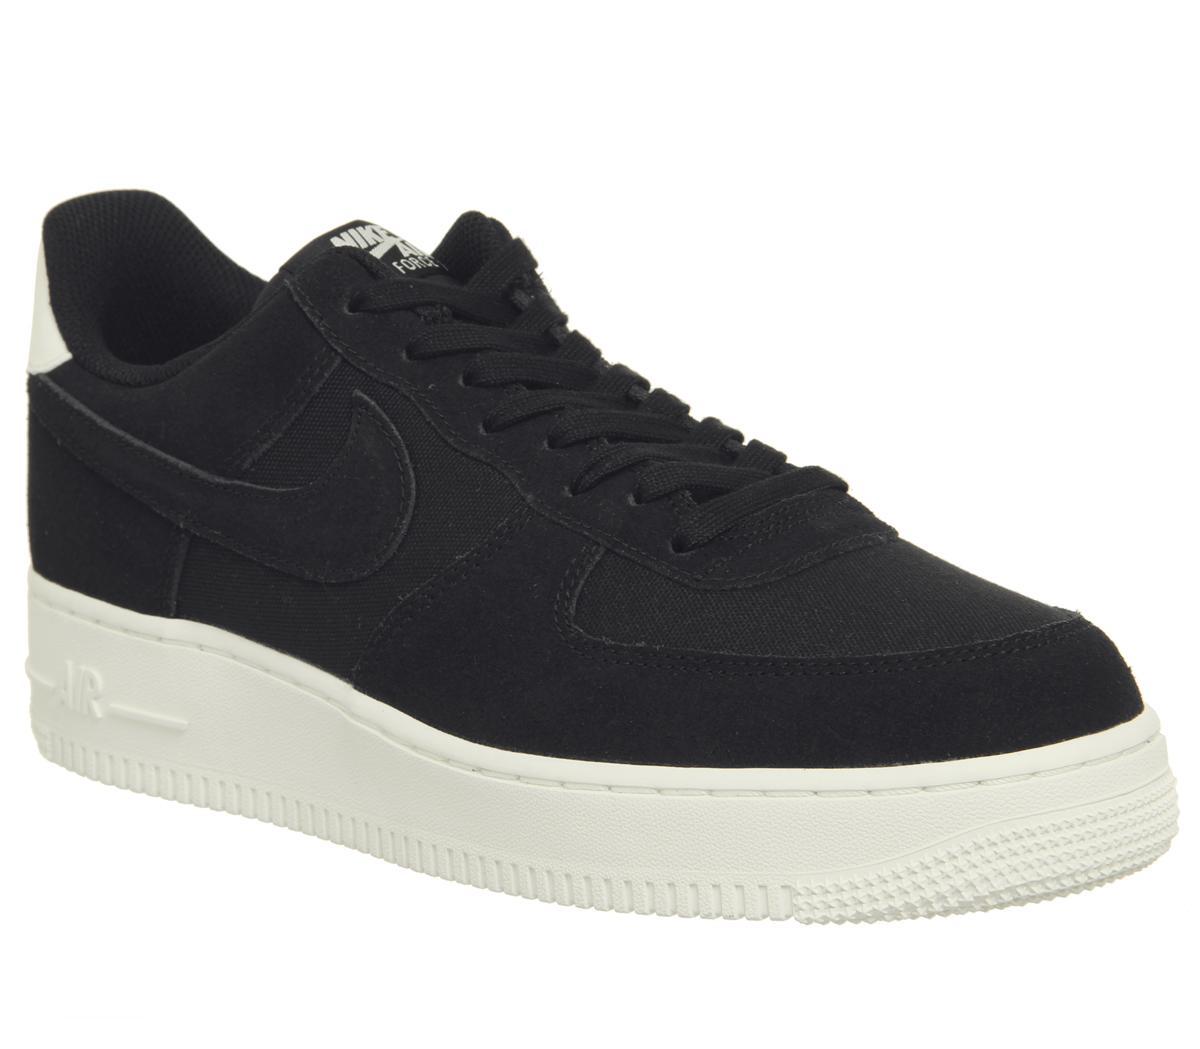 Nike Air Force 1 07 Trainers Black Sail